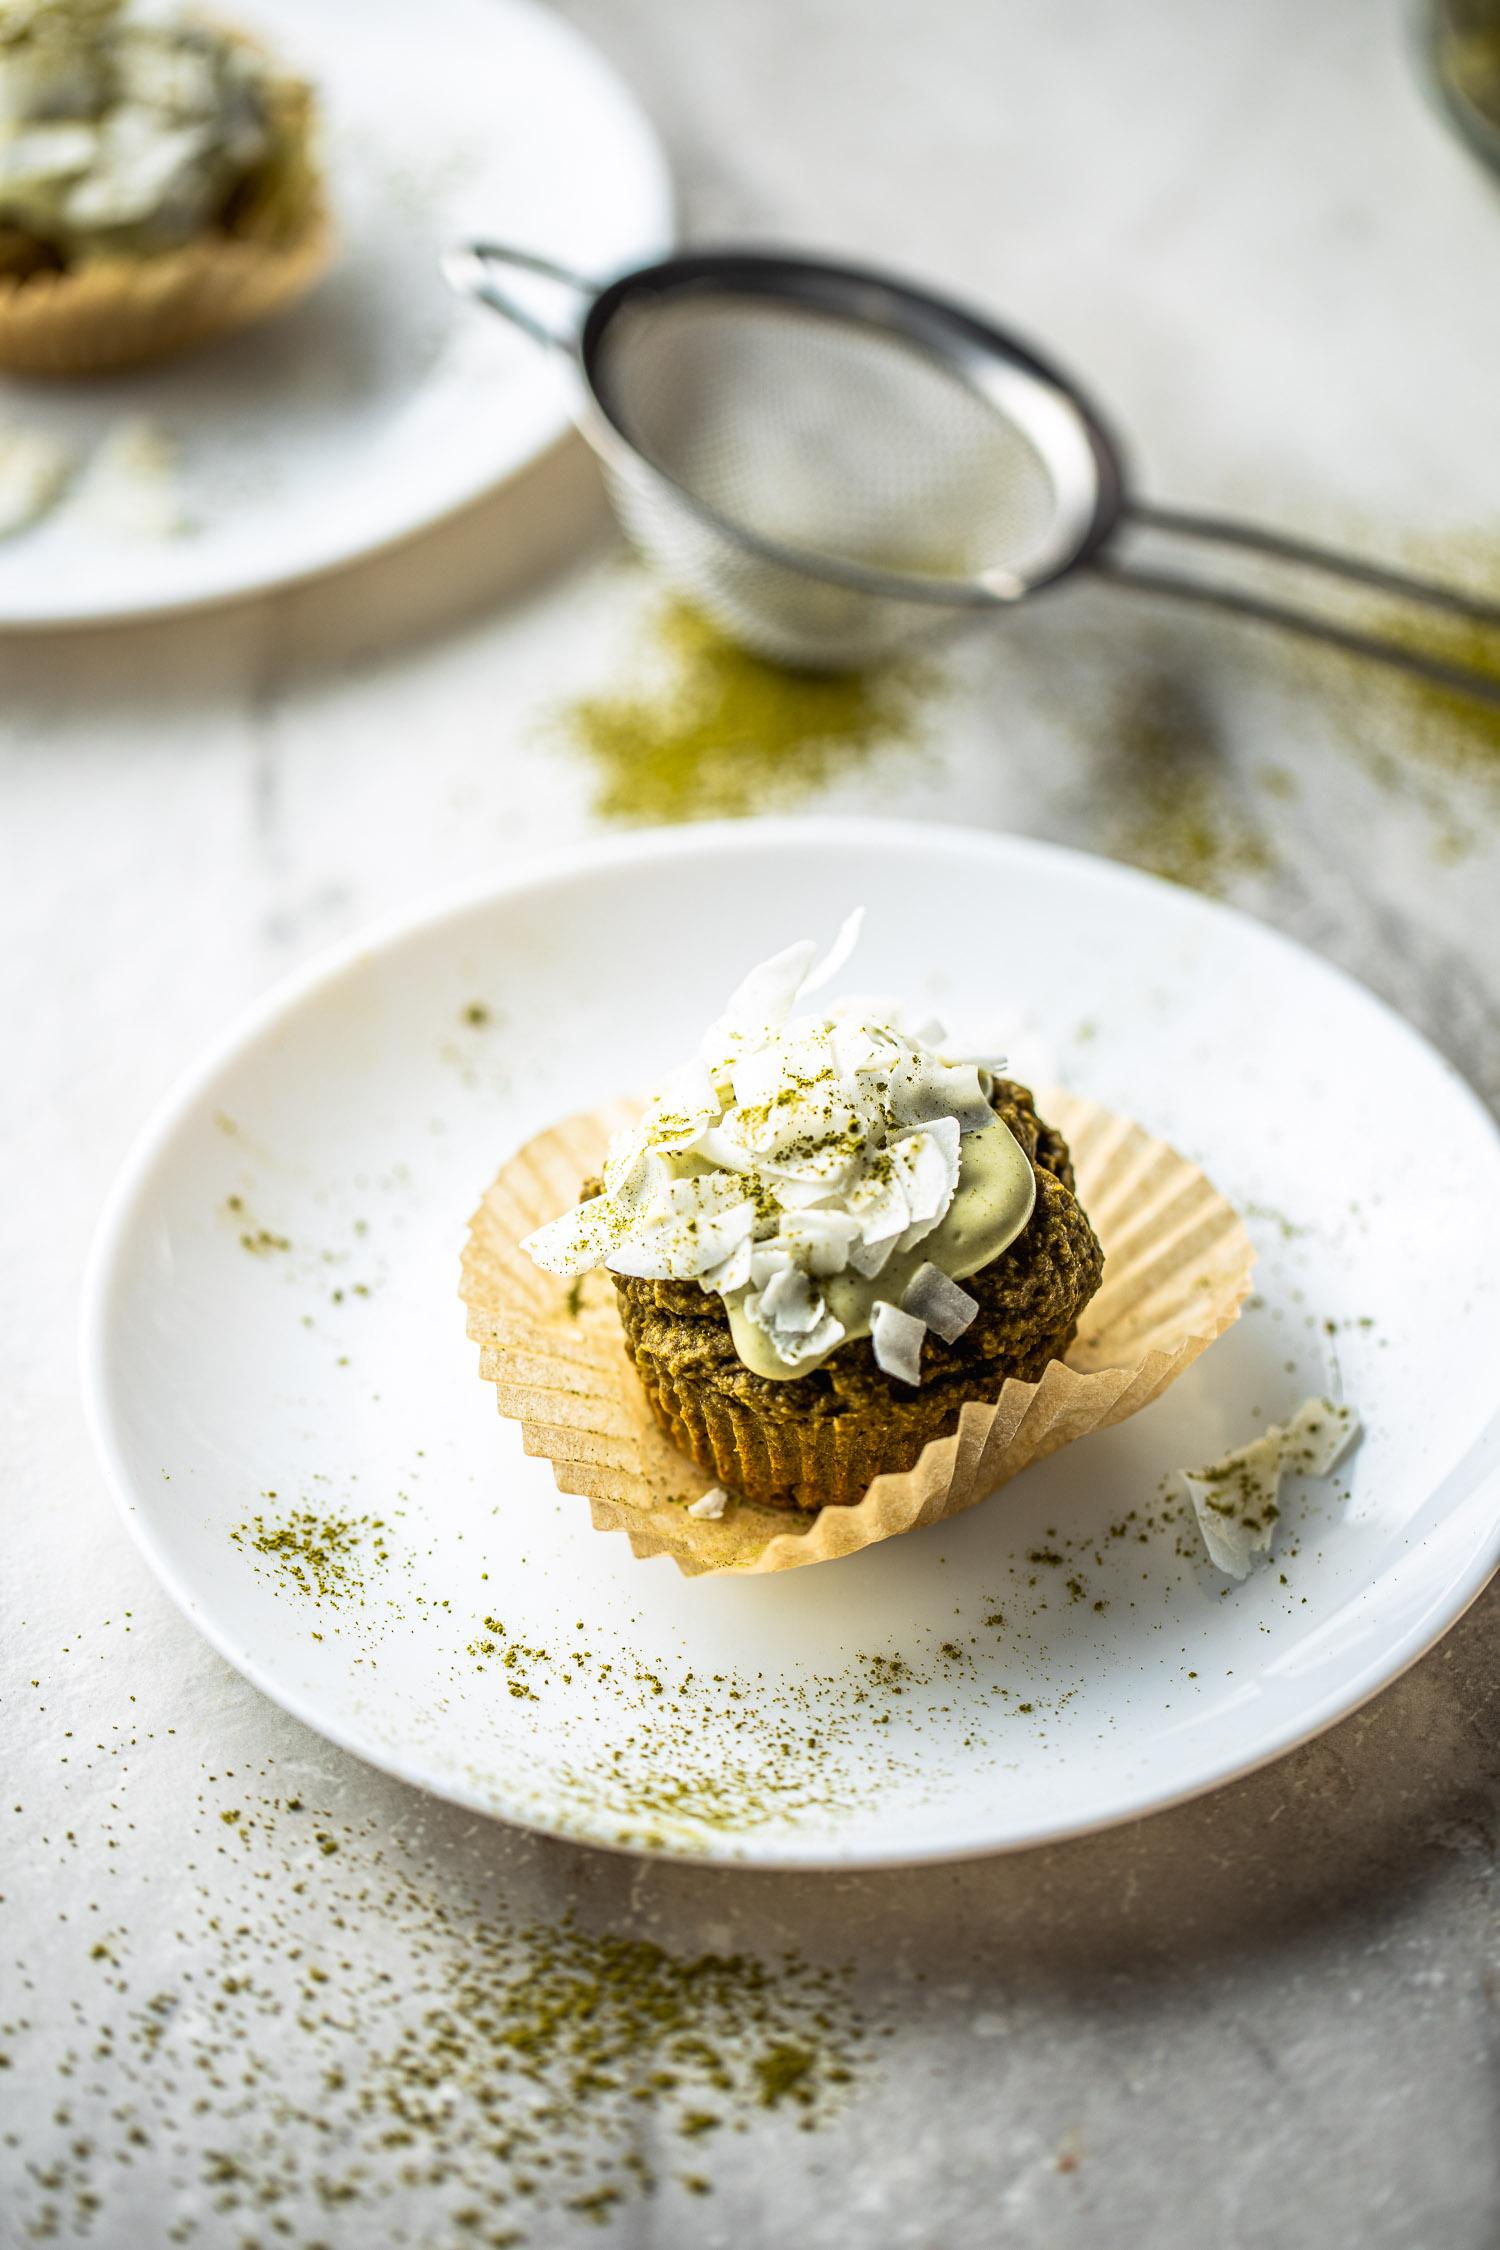 healthy dessert, gluten free, green tea, vegan, cupcake